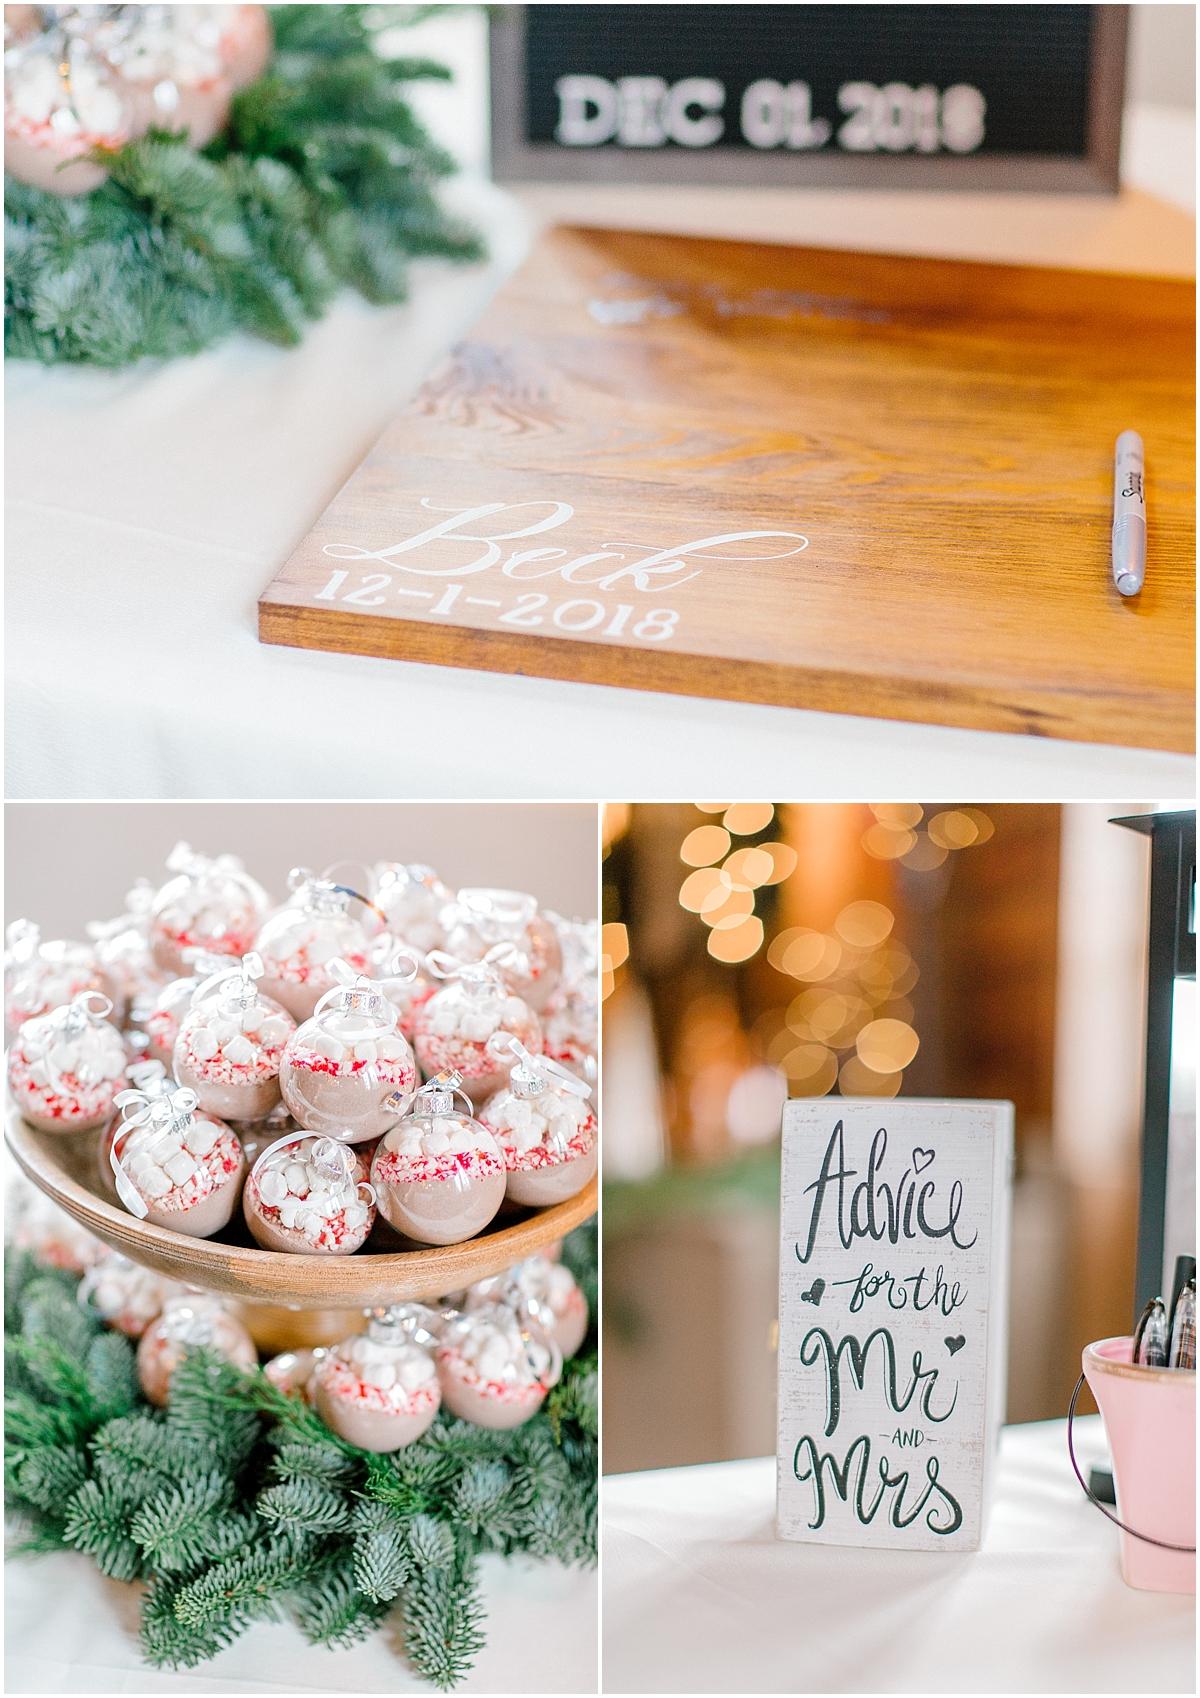 Chehalis Washington Winter Wedding Silver and White | Willapa Hills Farm Wedding | Eastham | Emma Rose Company PNW Light and Airy Wedding Photographer_0039.jpg